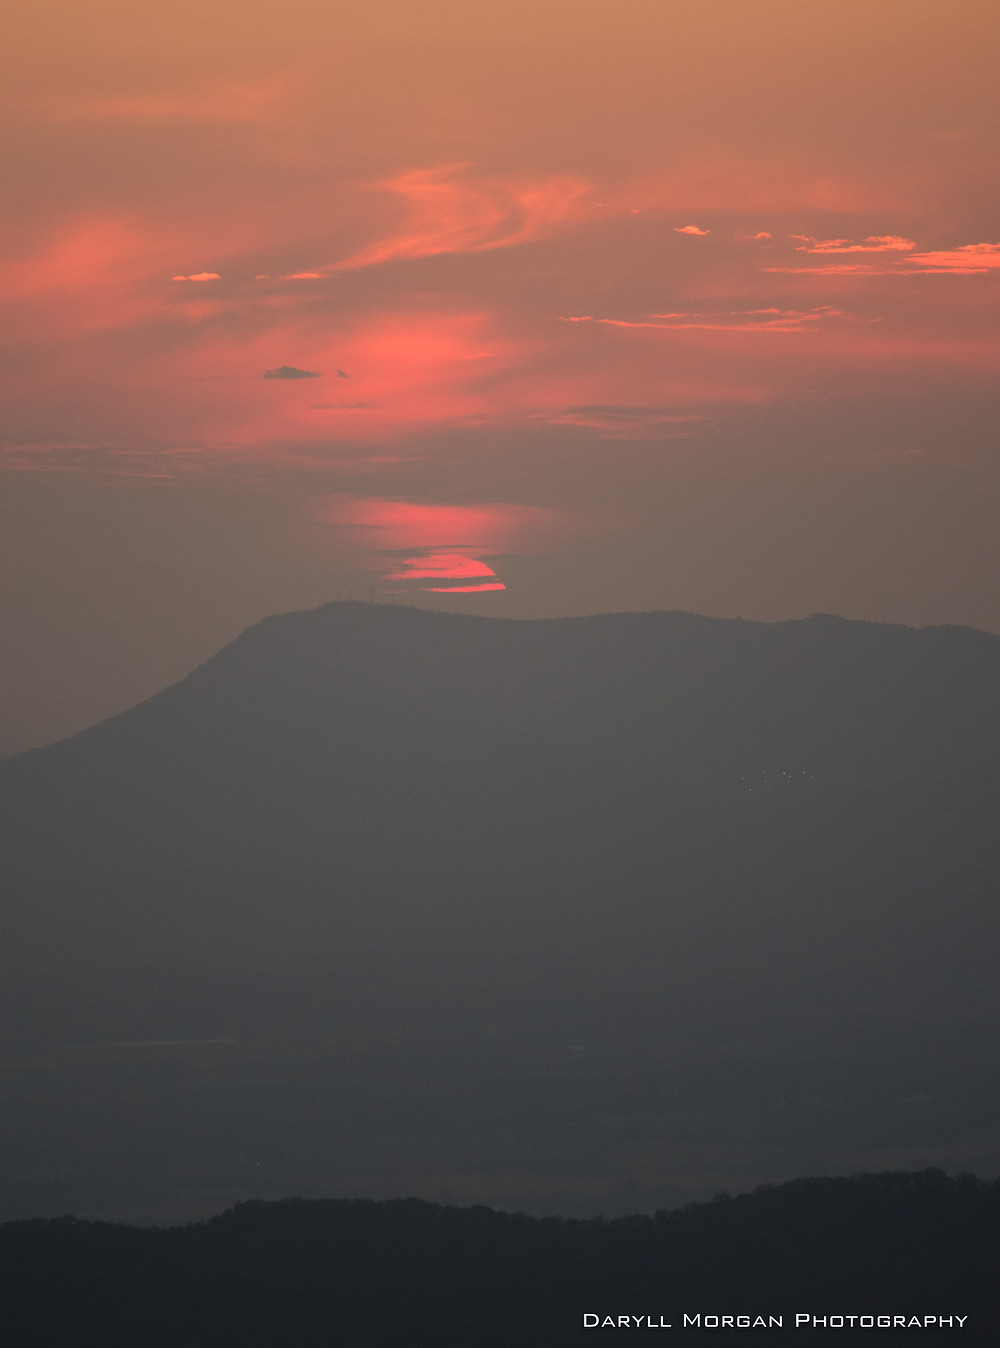 Red Sun at Dusk